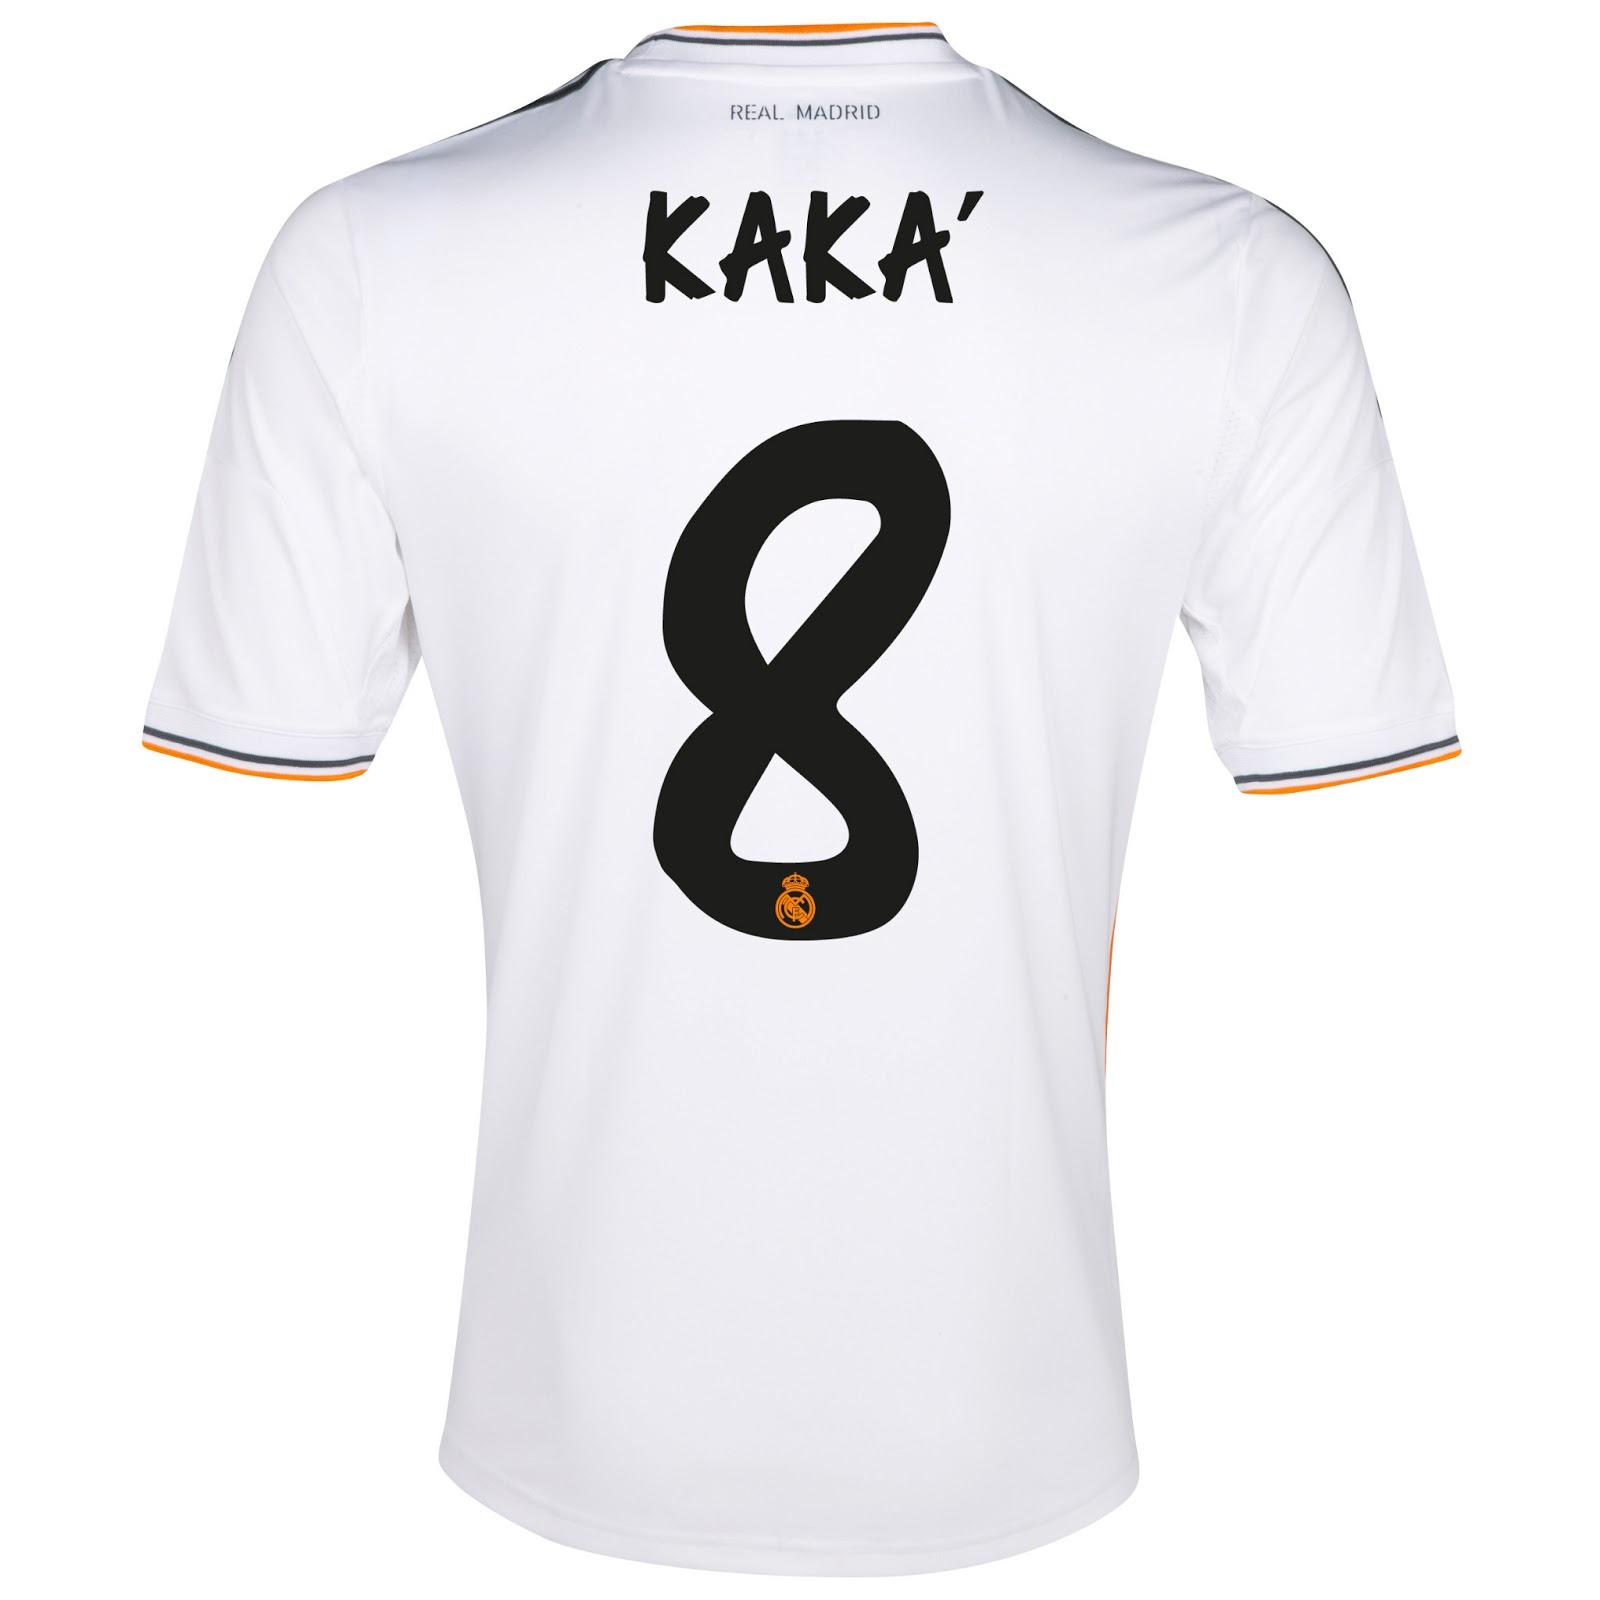 cc51efab3de New Football Shirts 13 14 - DREAMWORKS